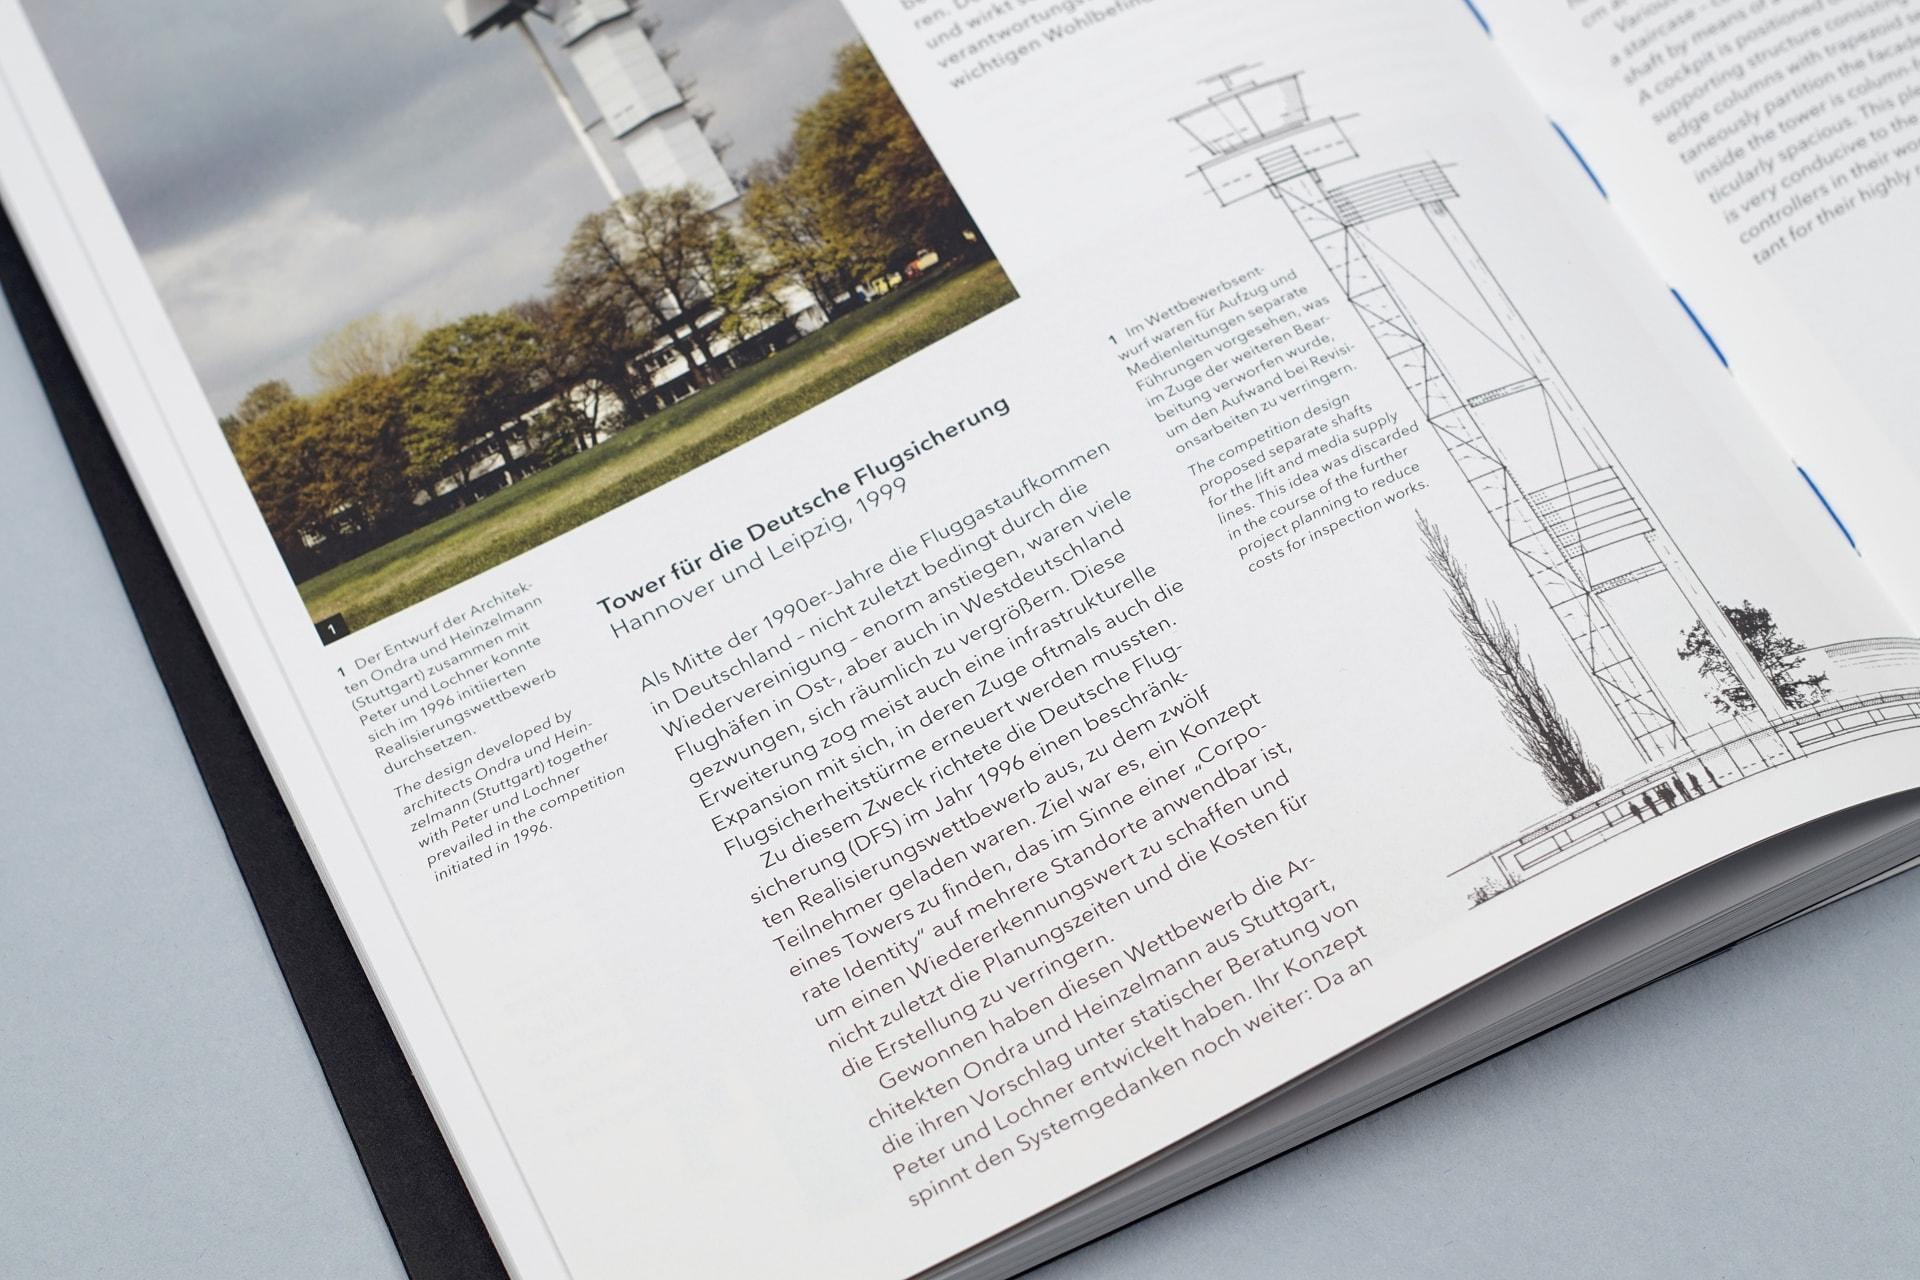 PUL Ingenieure – Monografie [Auftaktseiten]